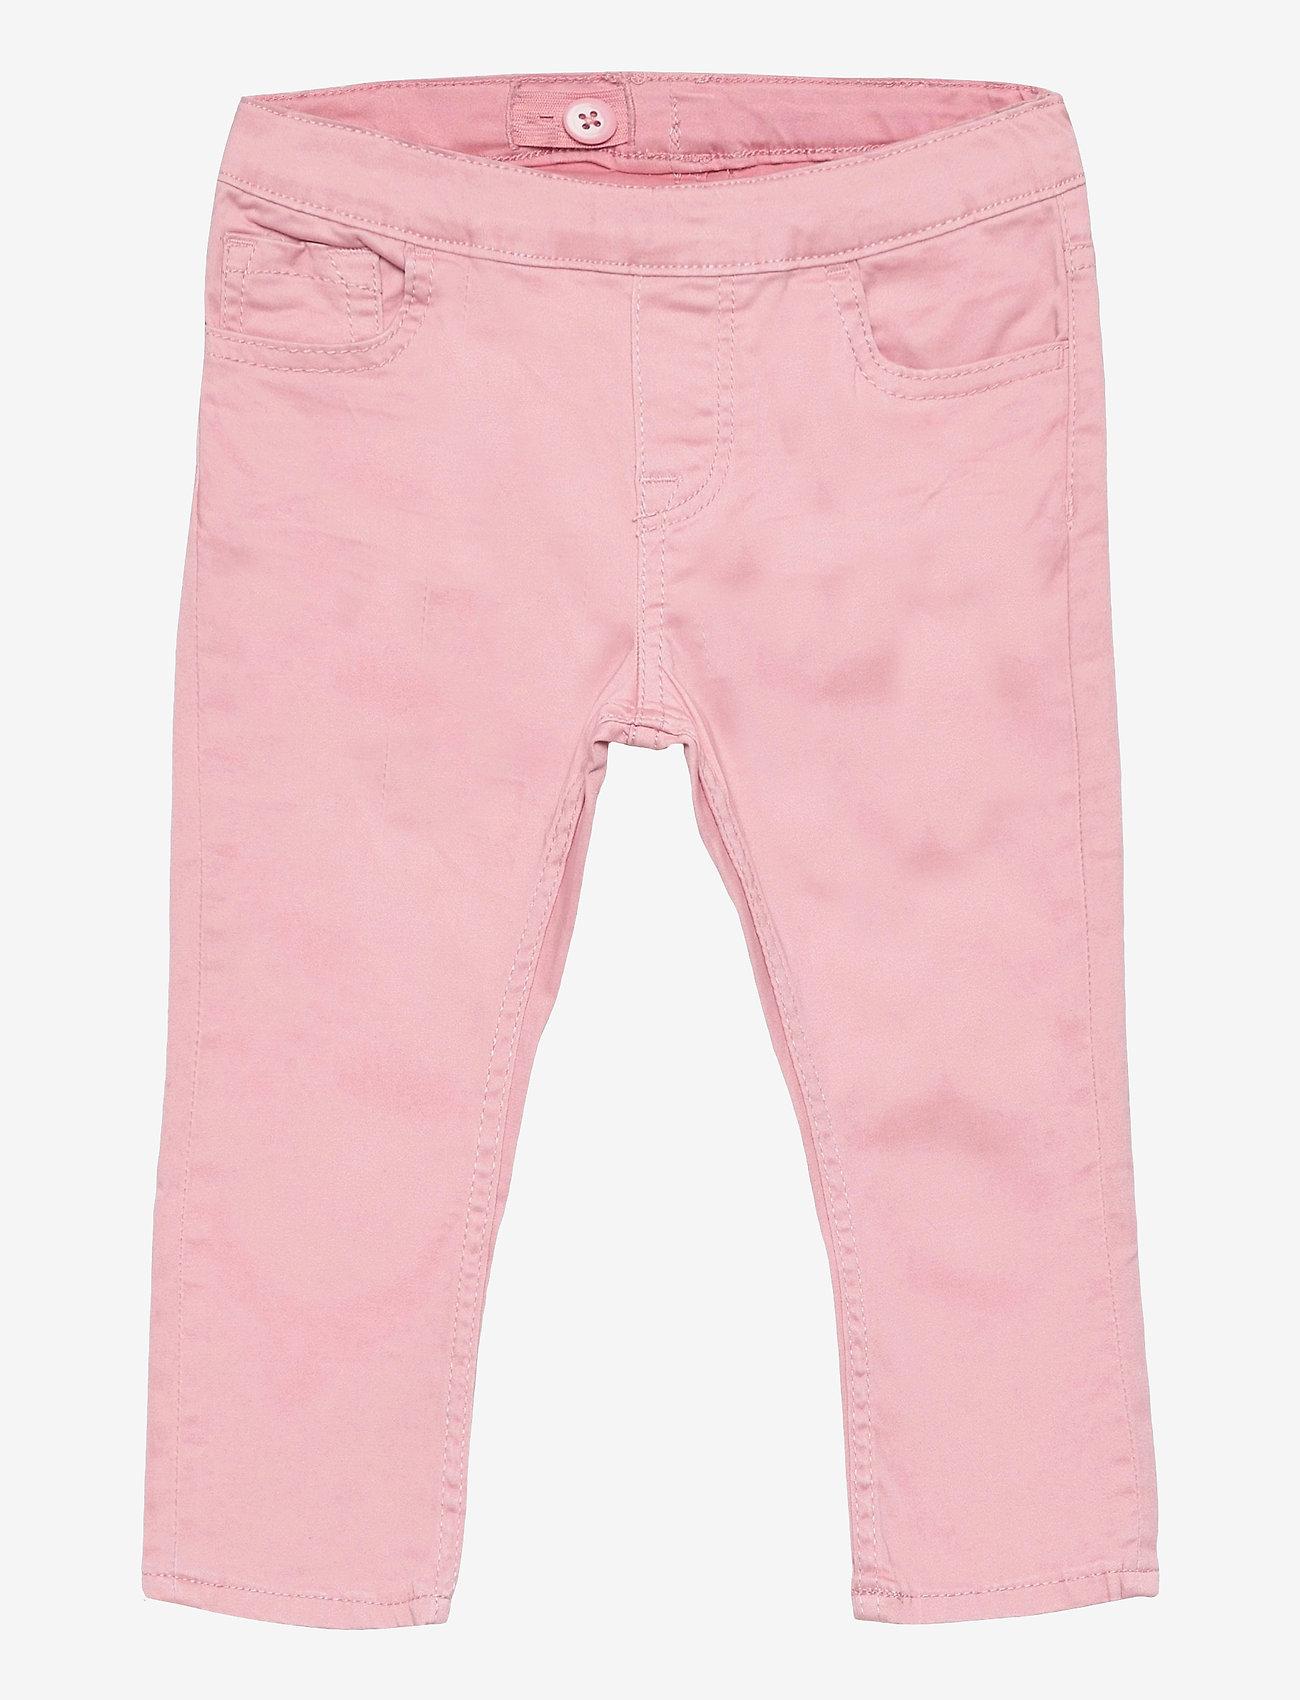 Polarn O. Pyret - Trousers Woven Preschool - trousers - bridal rose - 0